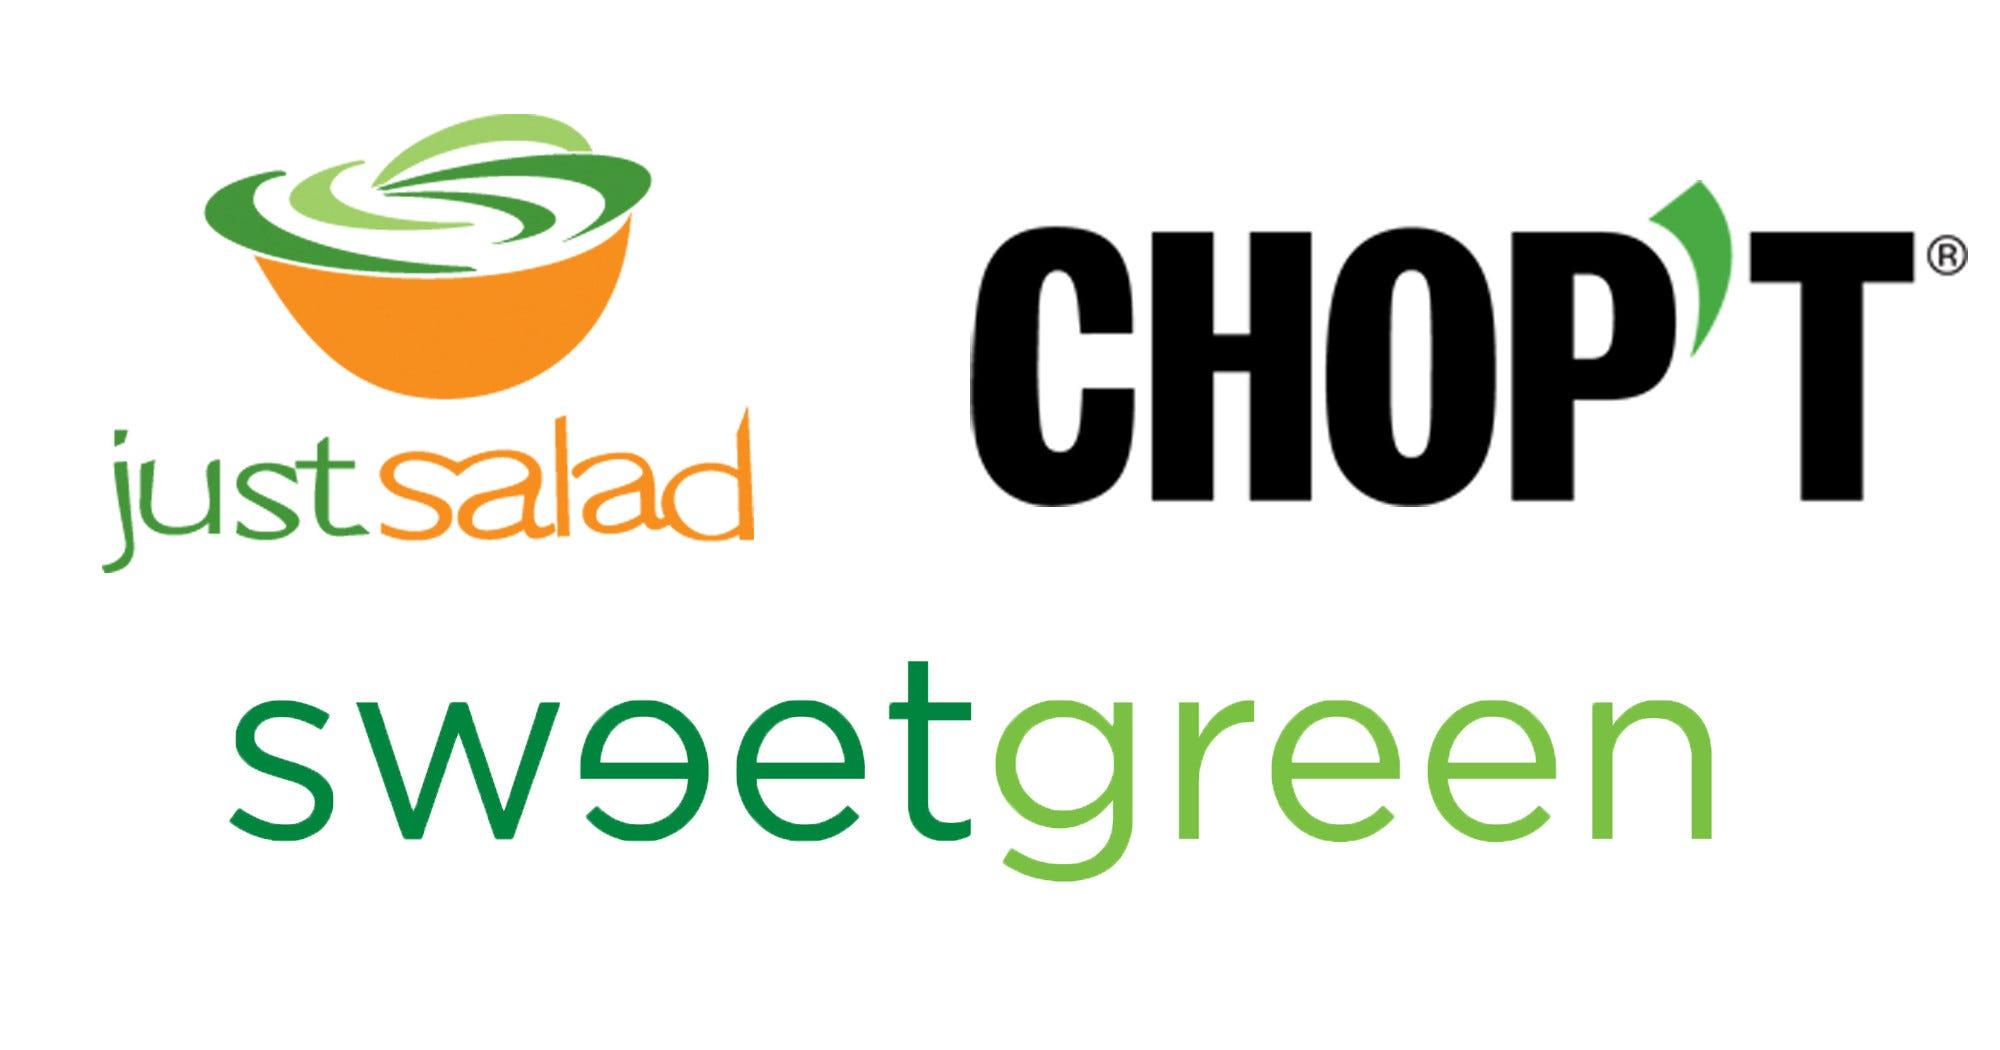 Best Salad Fast Food Meal.